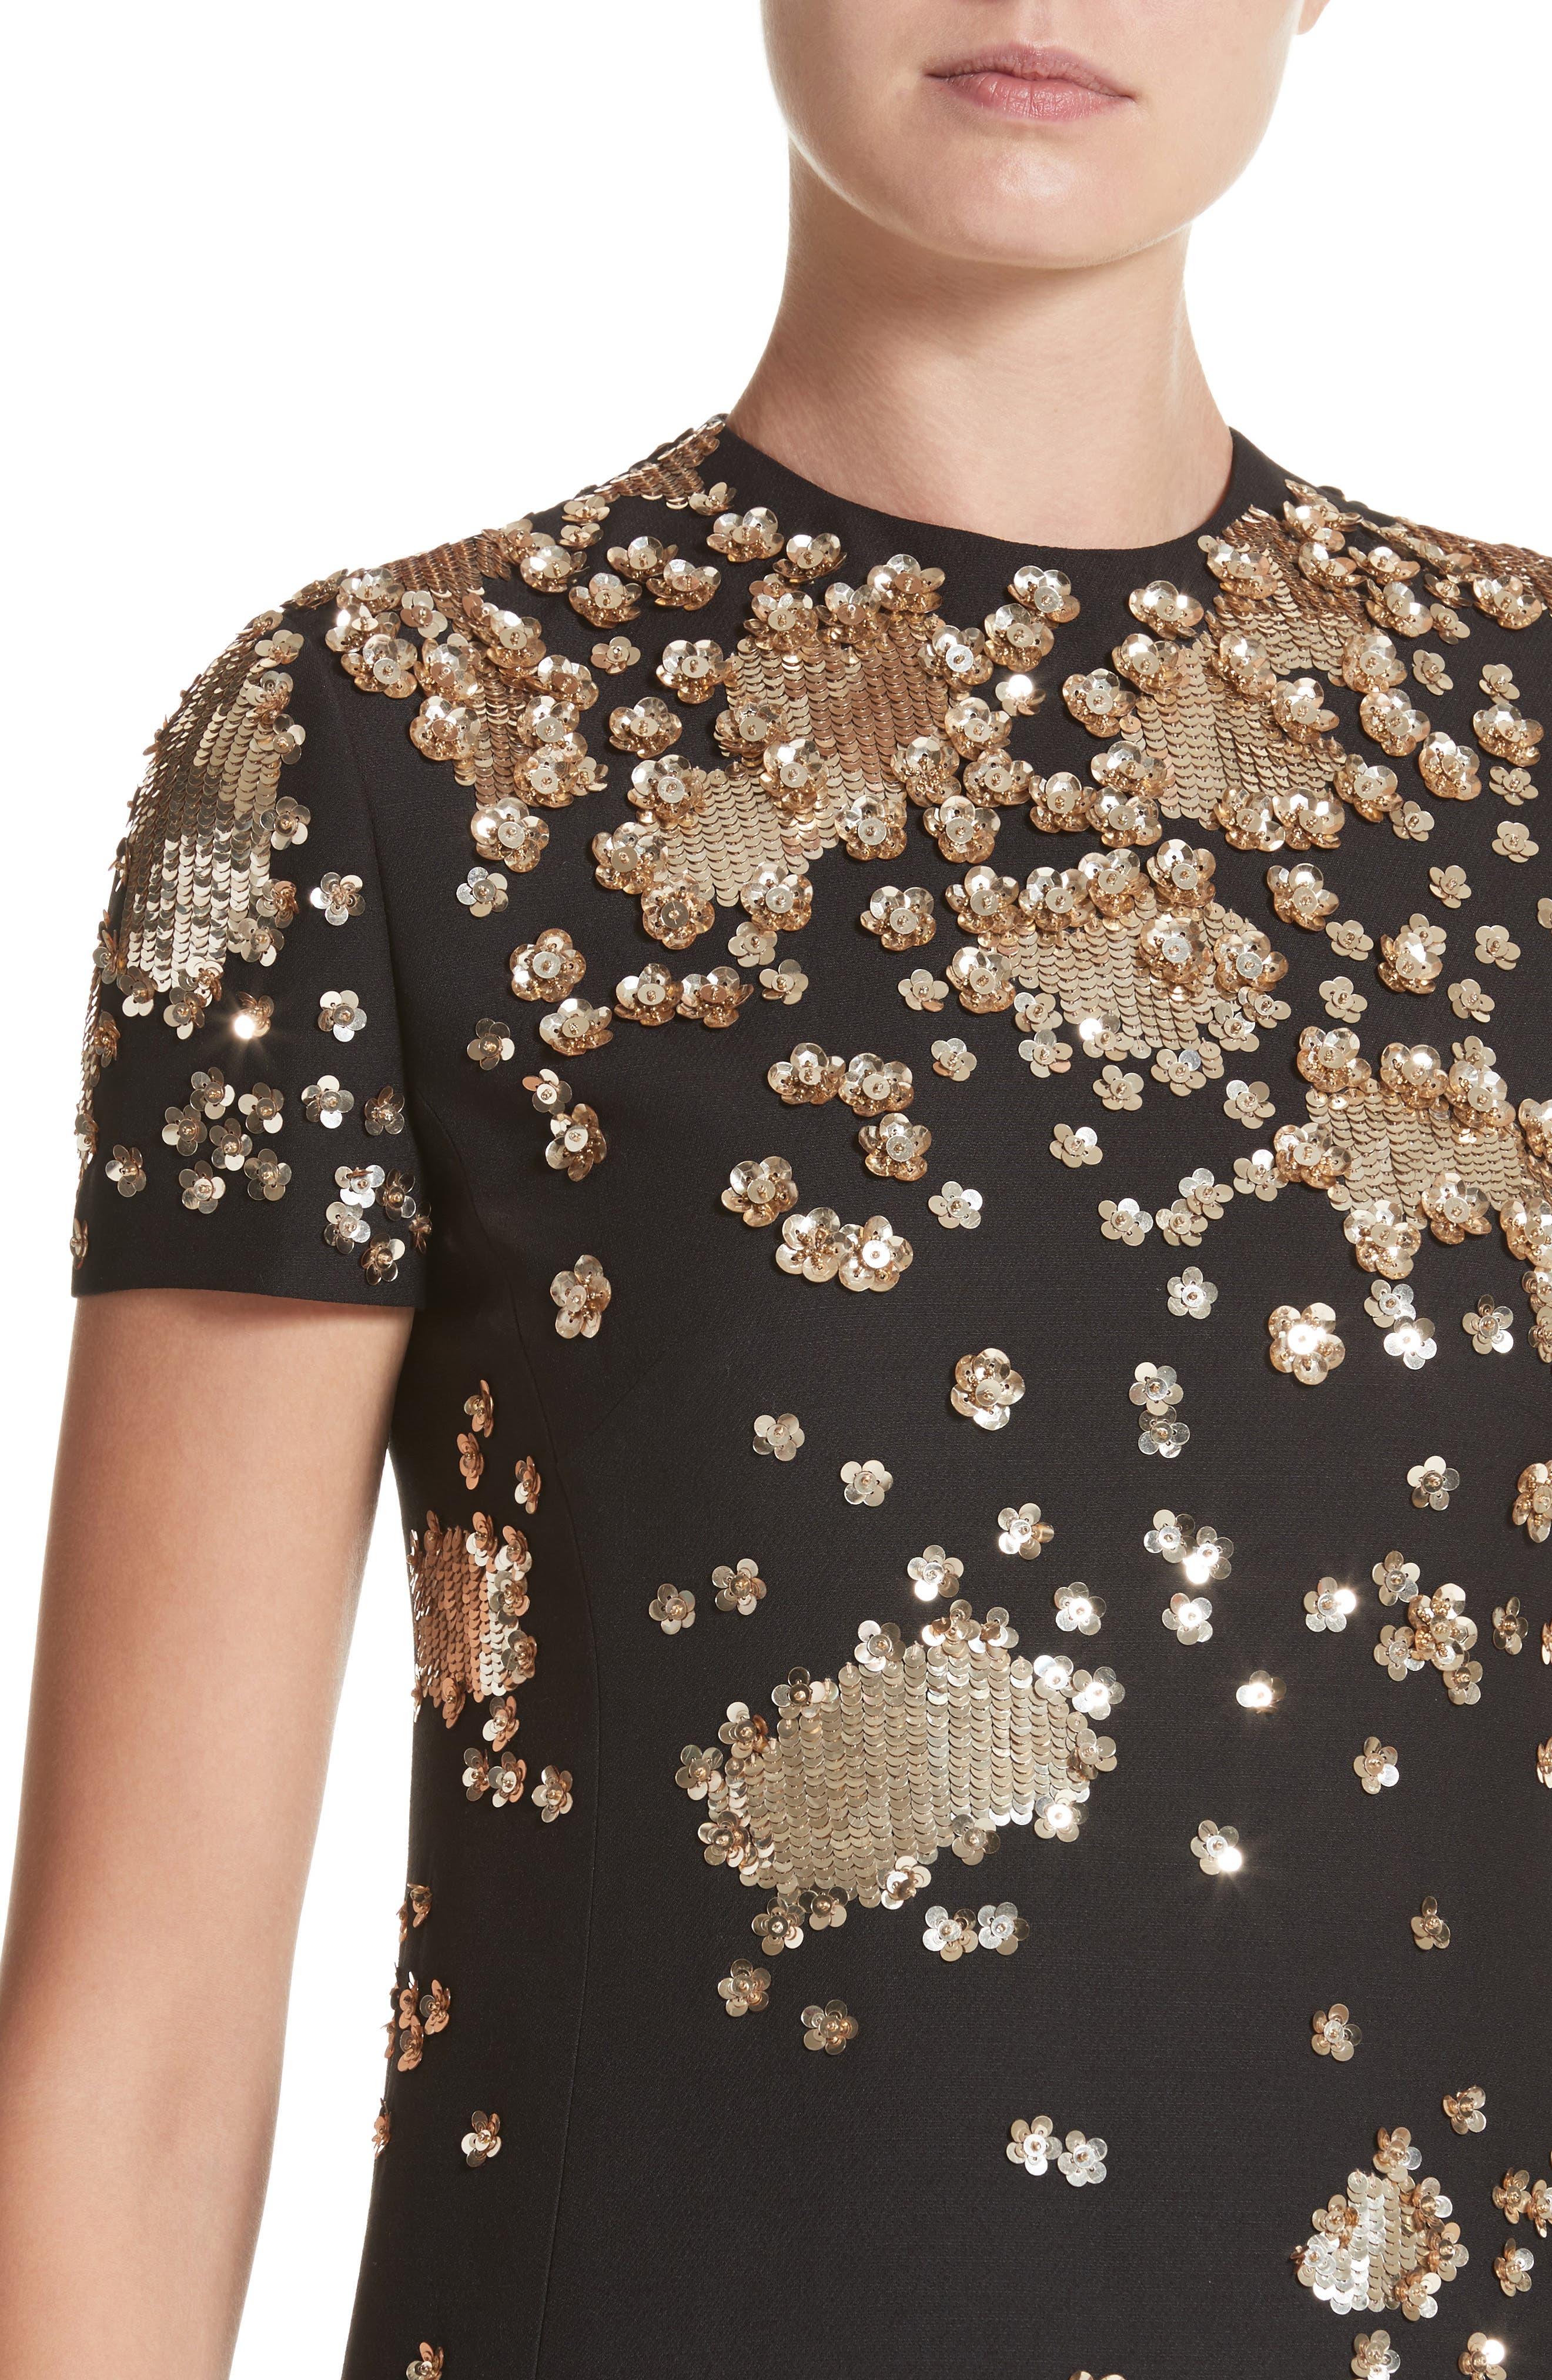 Embellished Wool & Silk Crepe Dress,                             Alternate thumbnail 4, color,                             BLACK